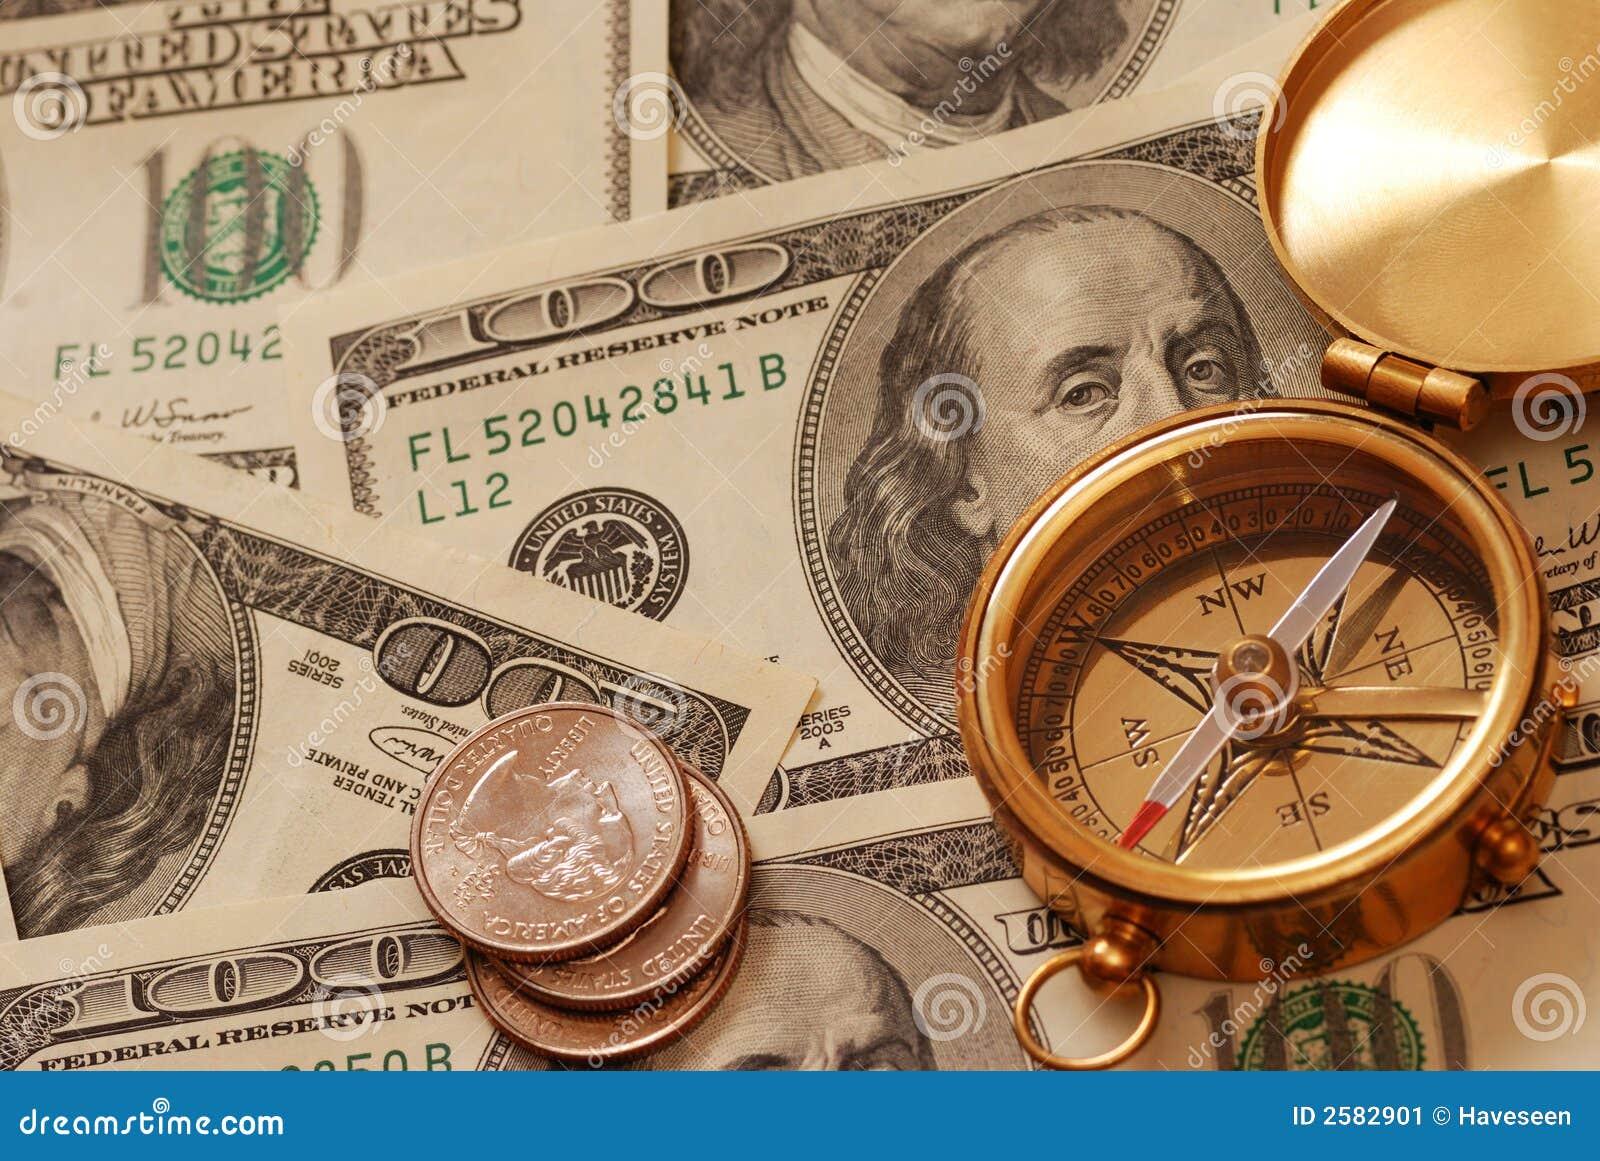 Antiek kompas over geld